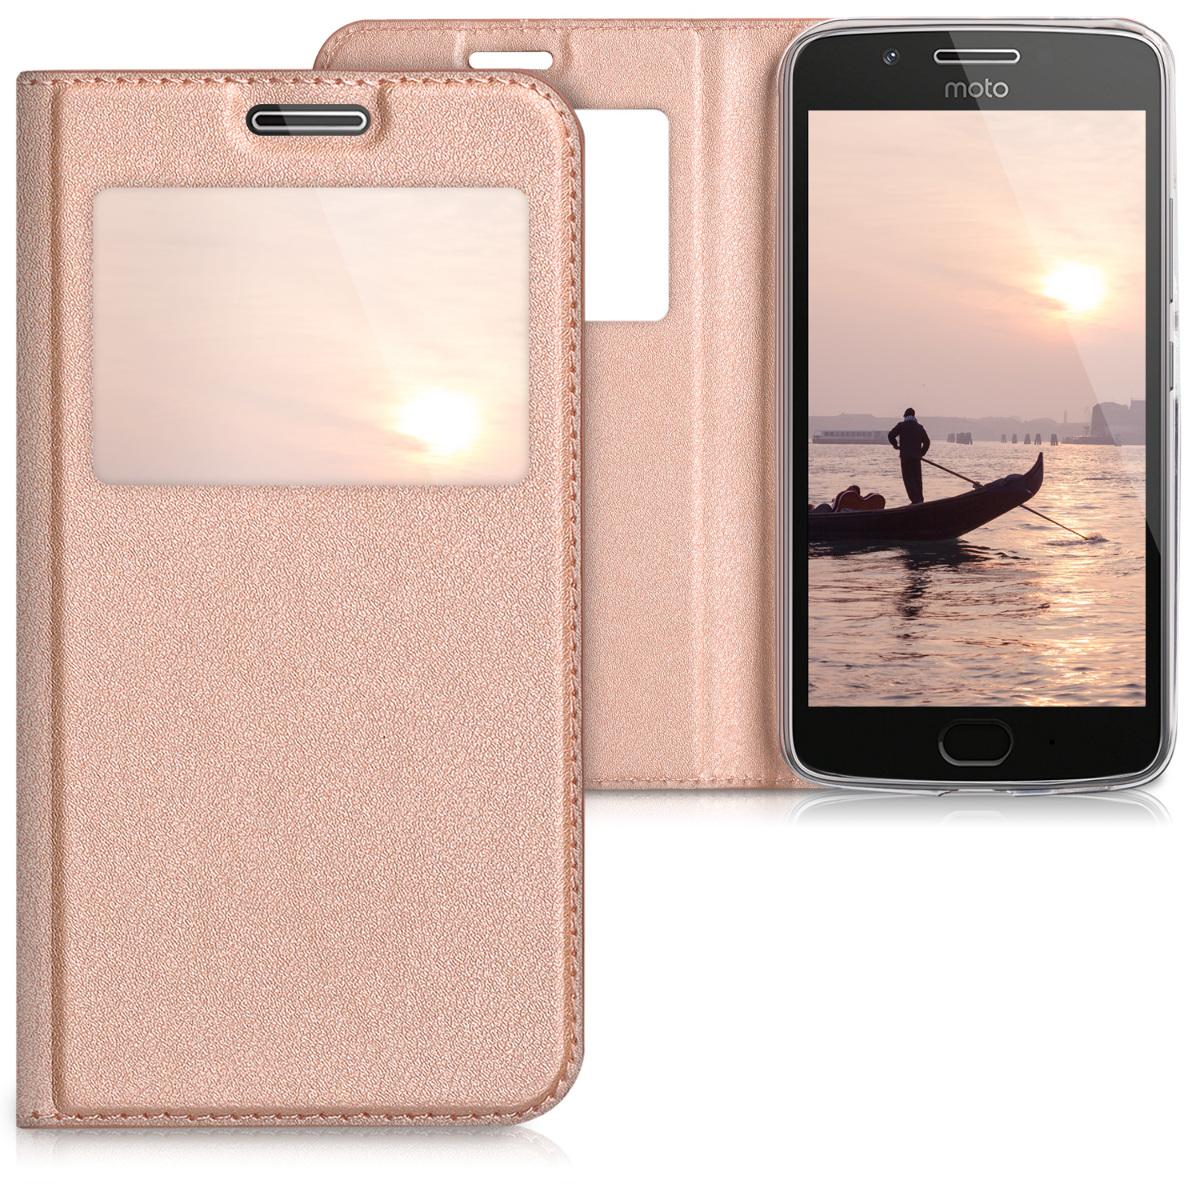 3x folie na display | screenprotector pouzdro | obal pro Motorola Moto G5 - Růžově zlatá